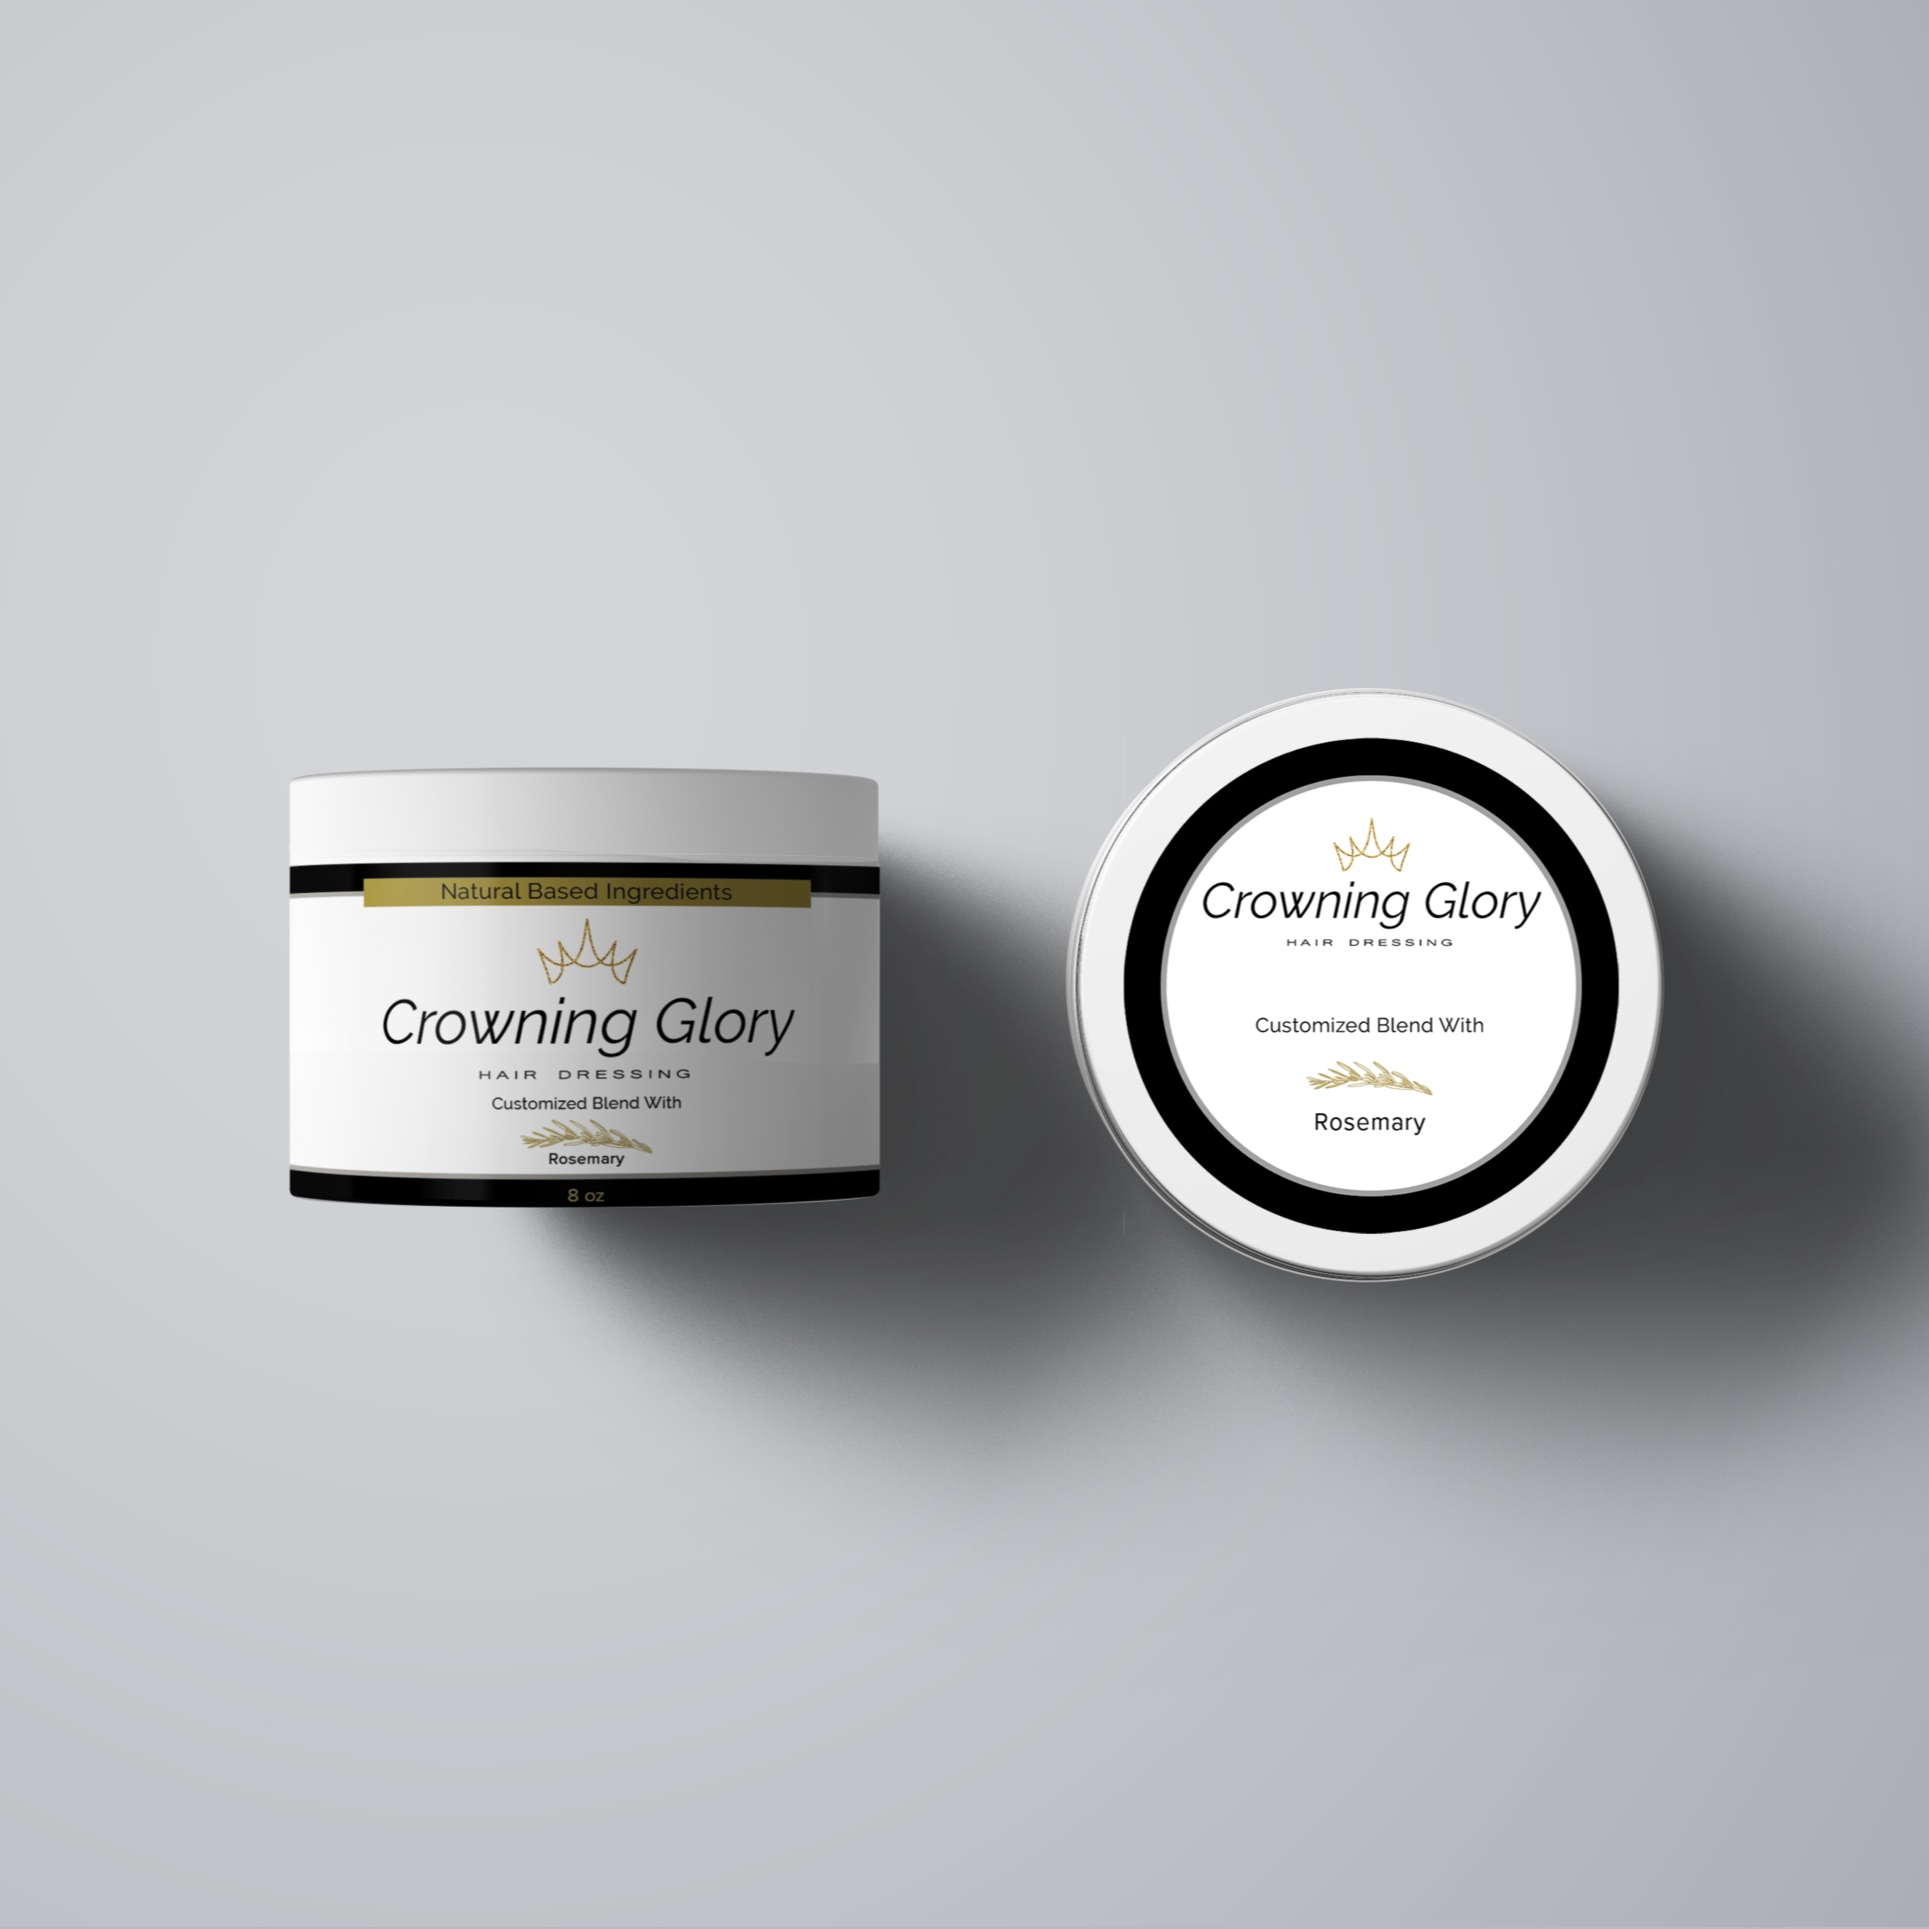 Crowning Glory - Custom Label Design for Jar